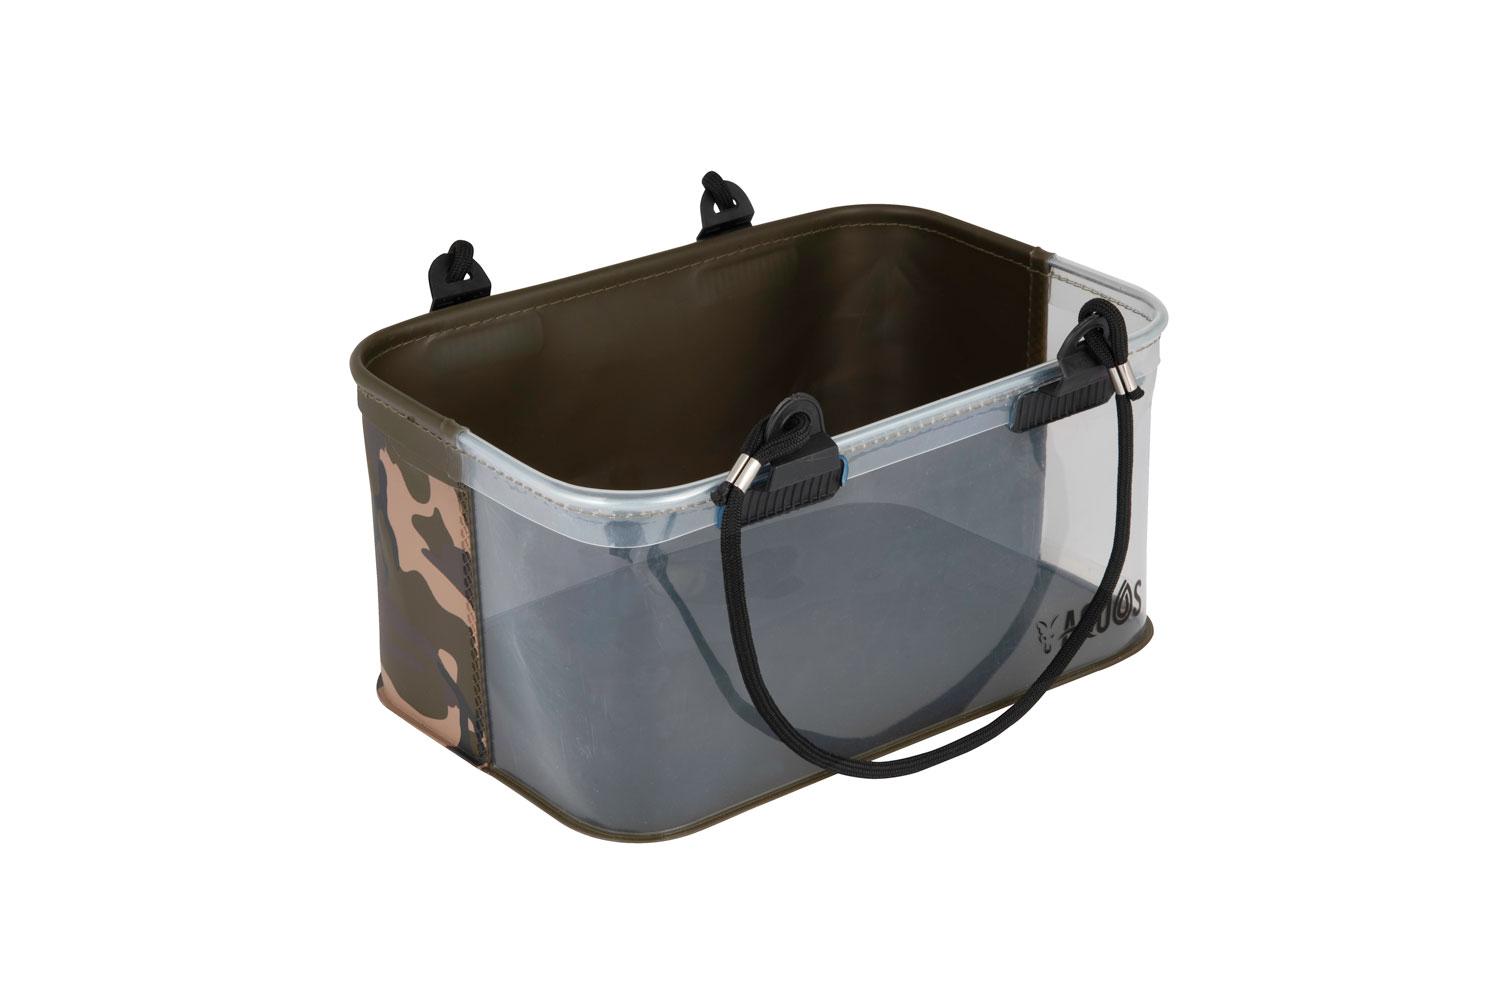 aquos_camolite_water__rig_bucket_main_1jpg